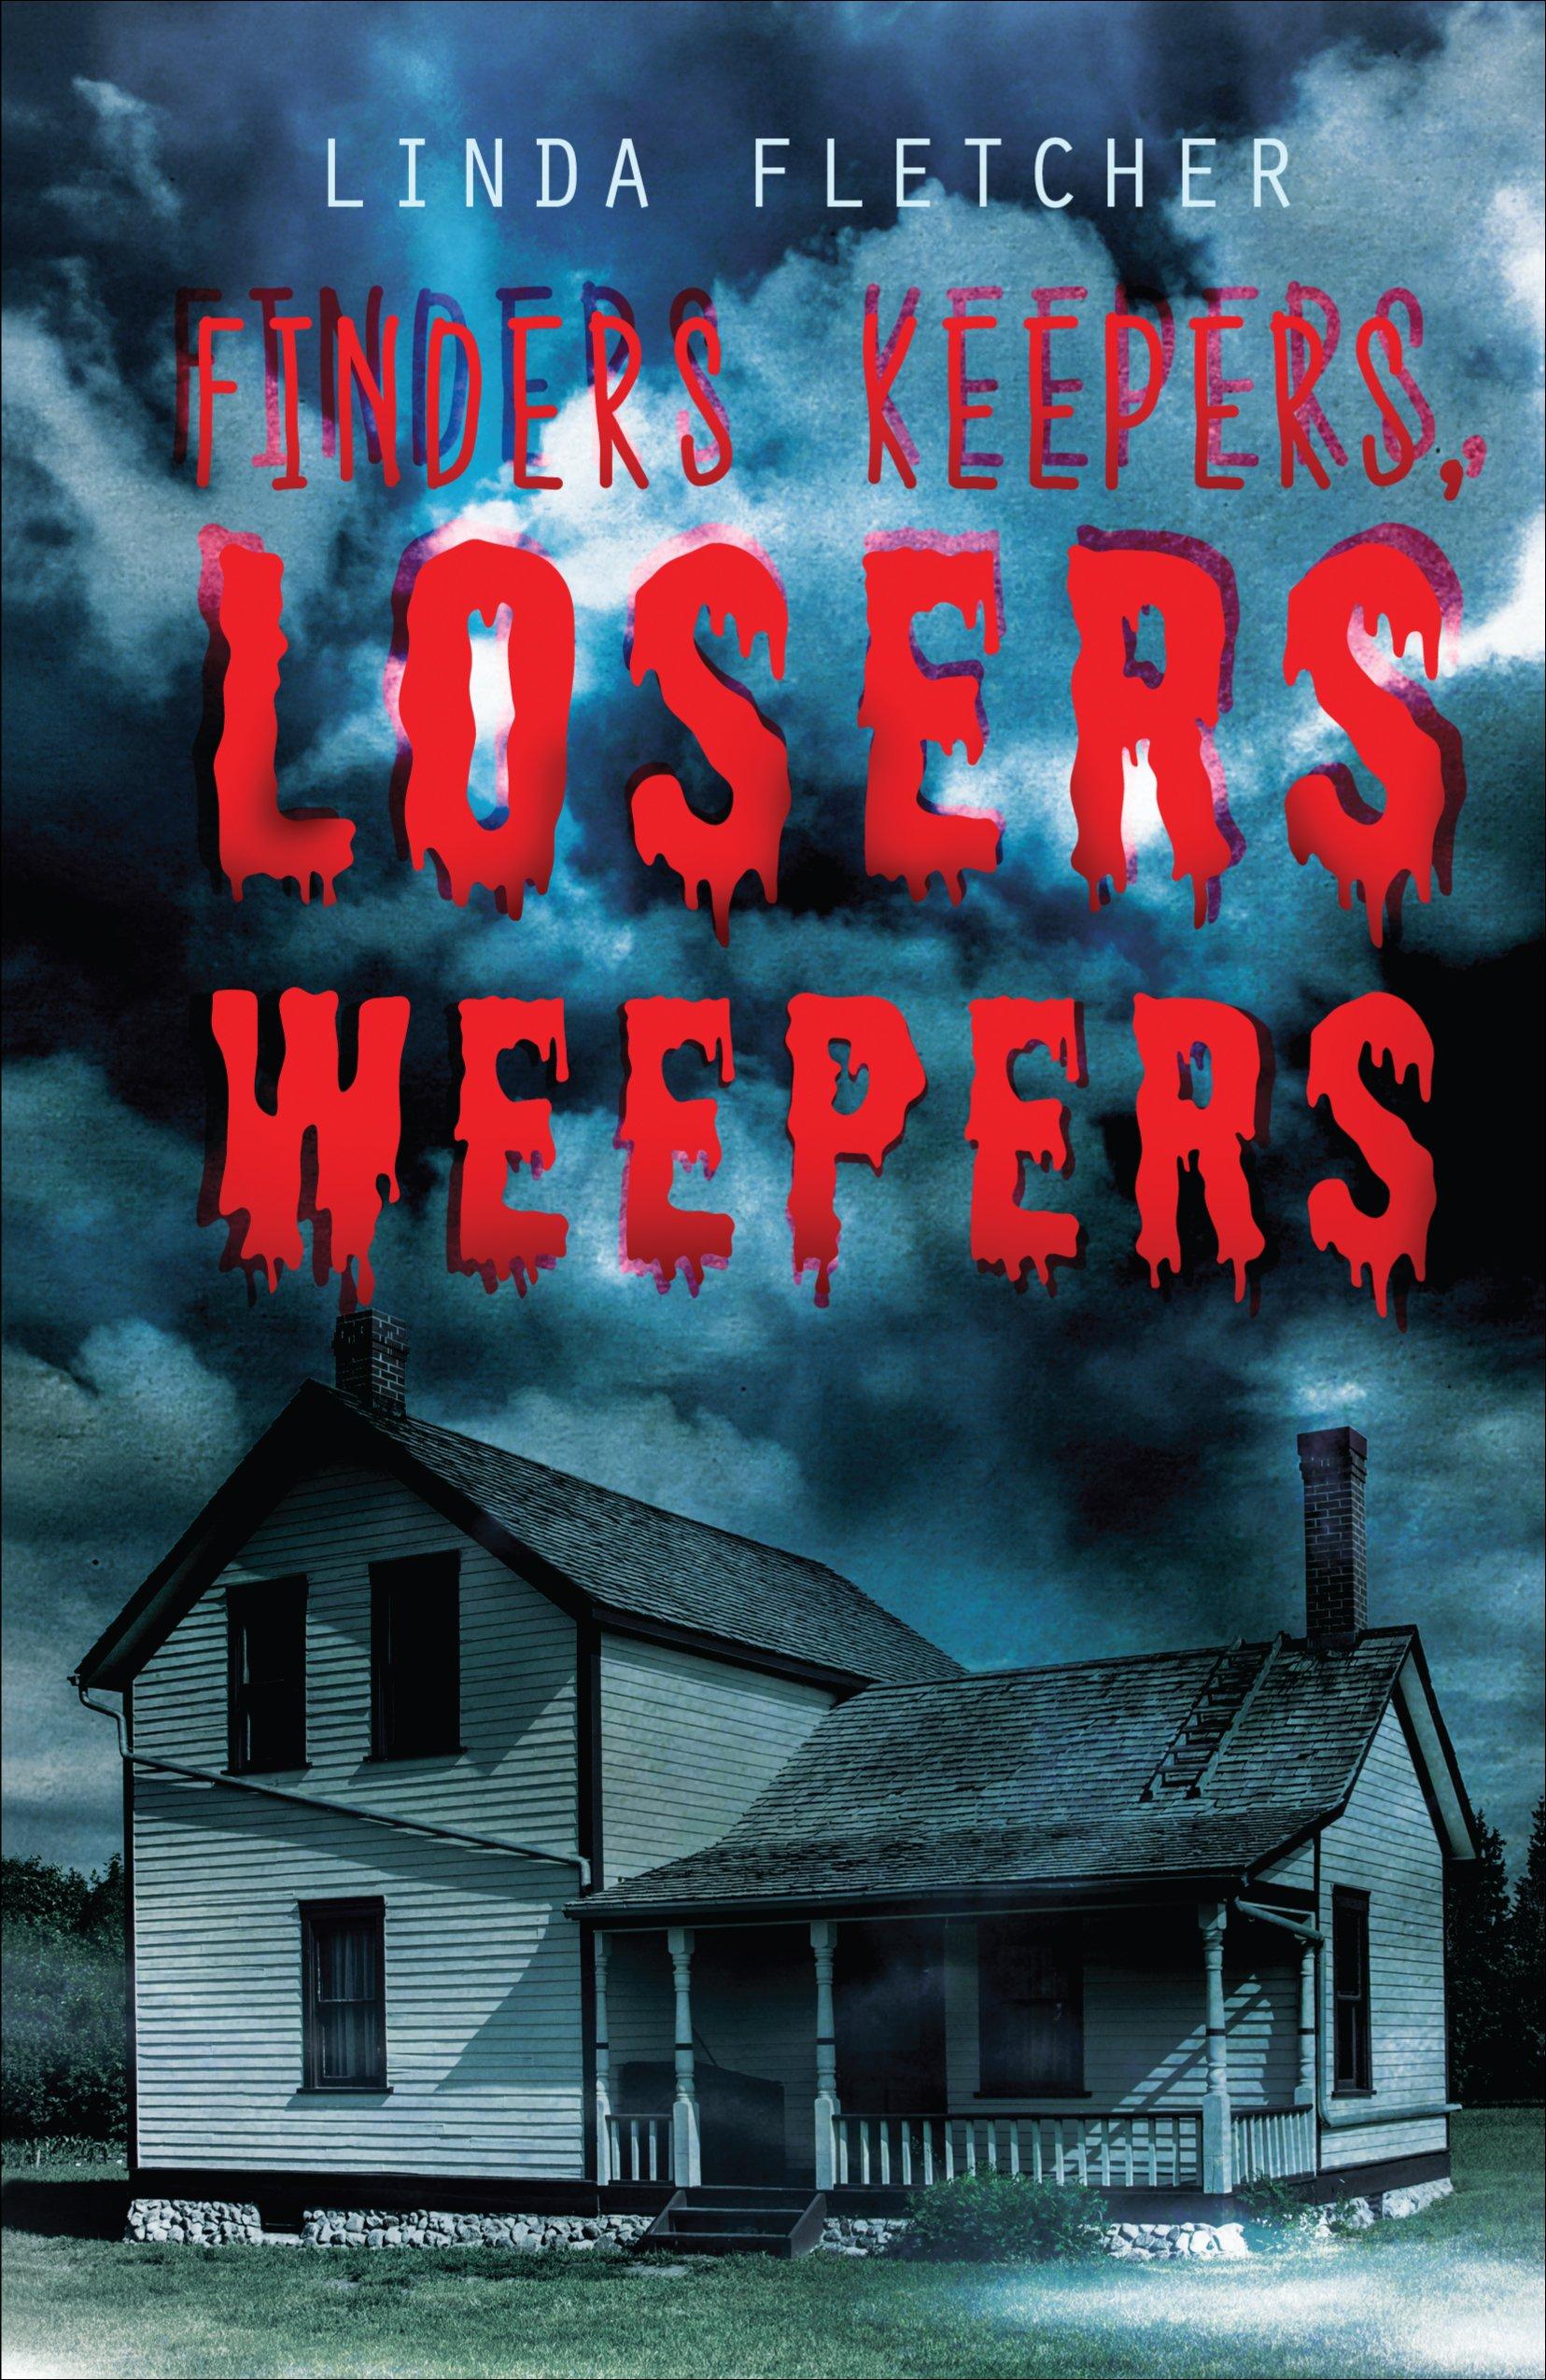 Finders Keepers, Losers Weepers pdf